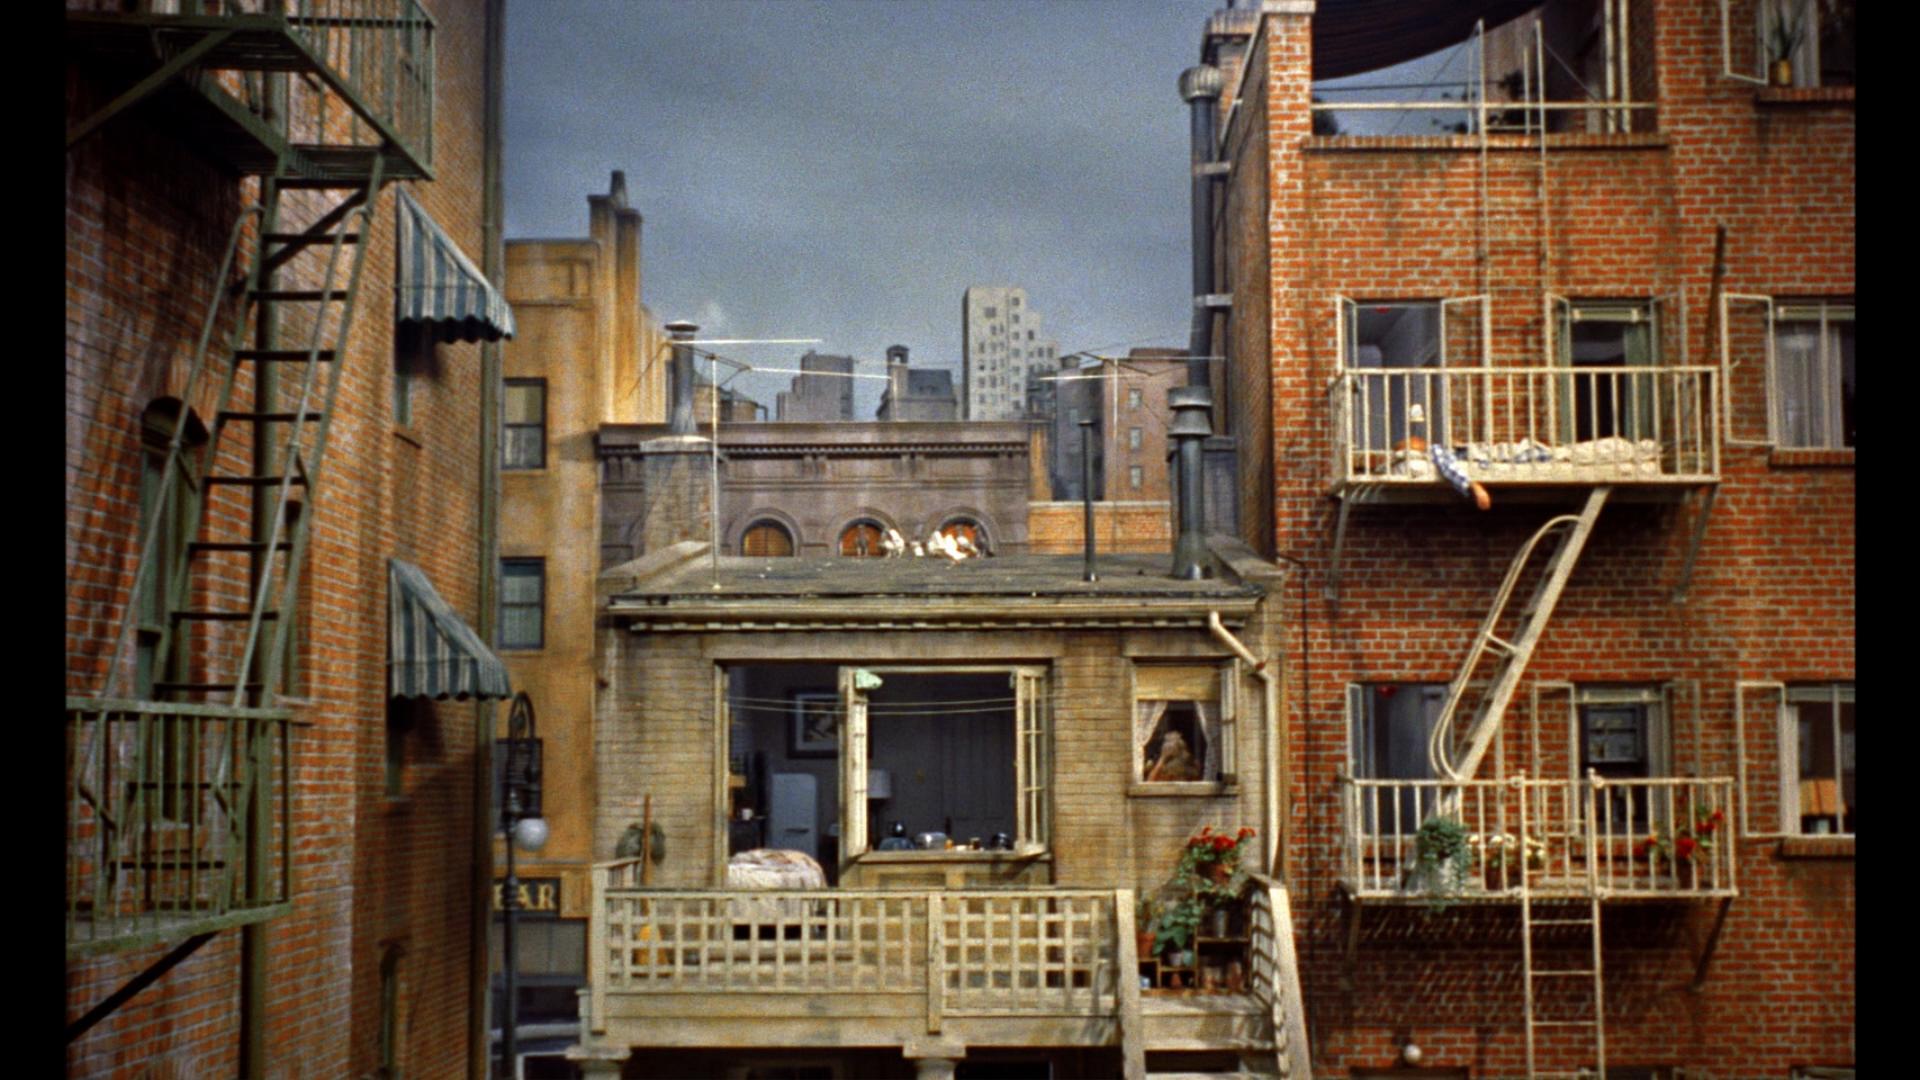 rear_window_apartment_view  MULTIGLOM